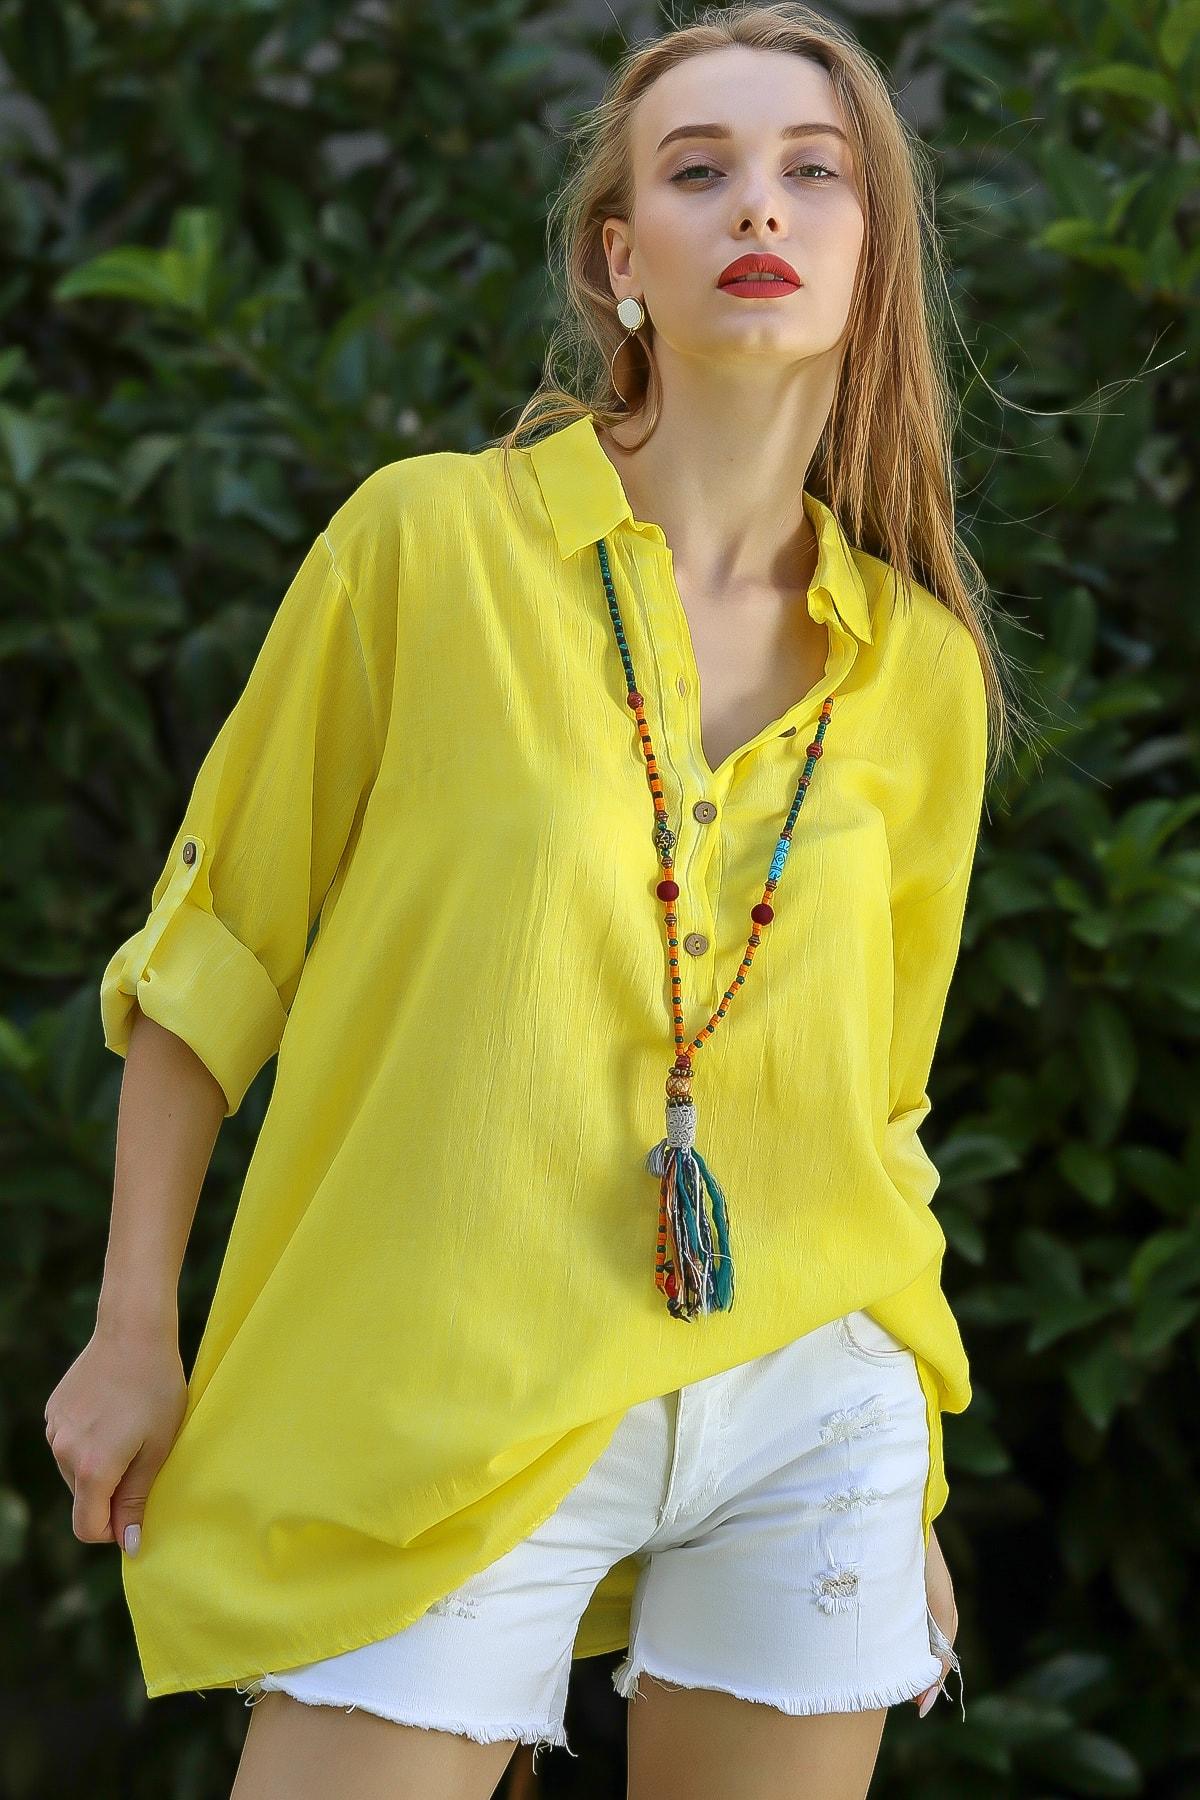 Chiccy Kadın Neon Sarı Casual Gömlek Yaka Pat Detaylı Yıkamalı Tunik Bluz M10010200Bl96076